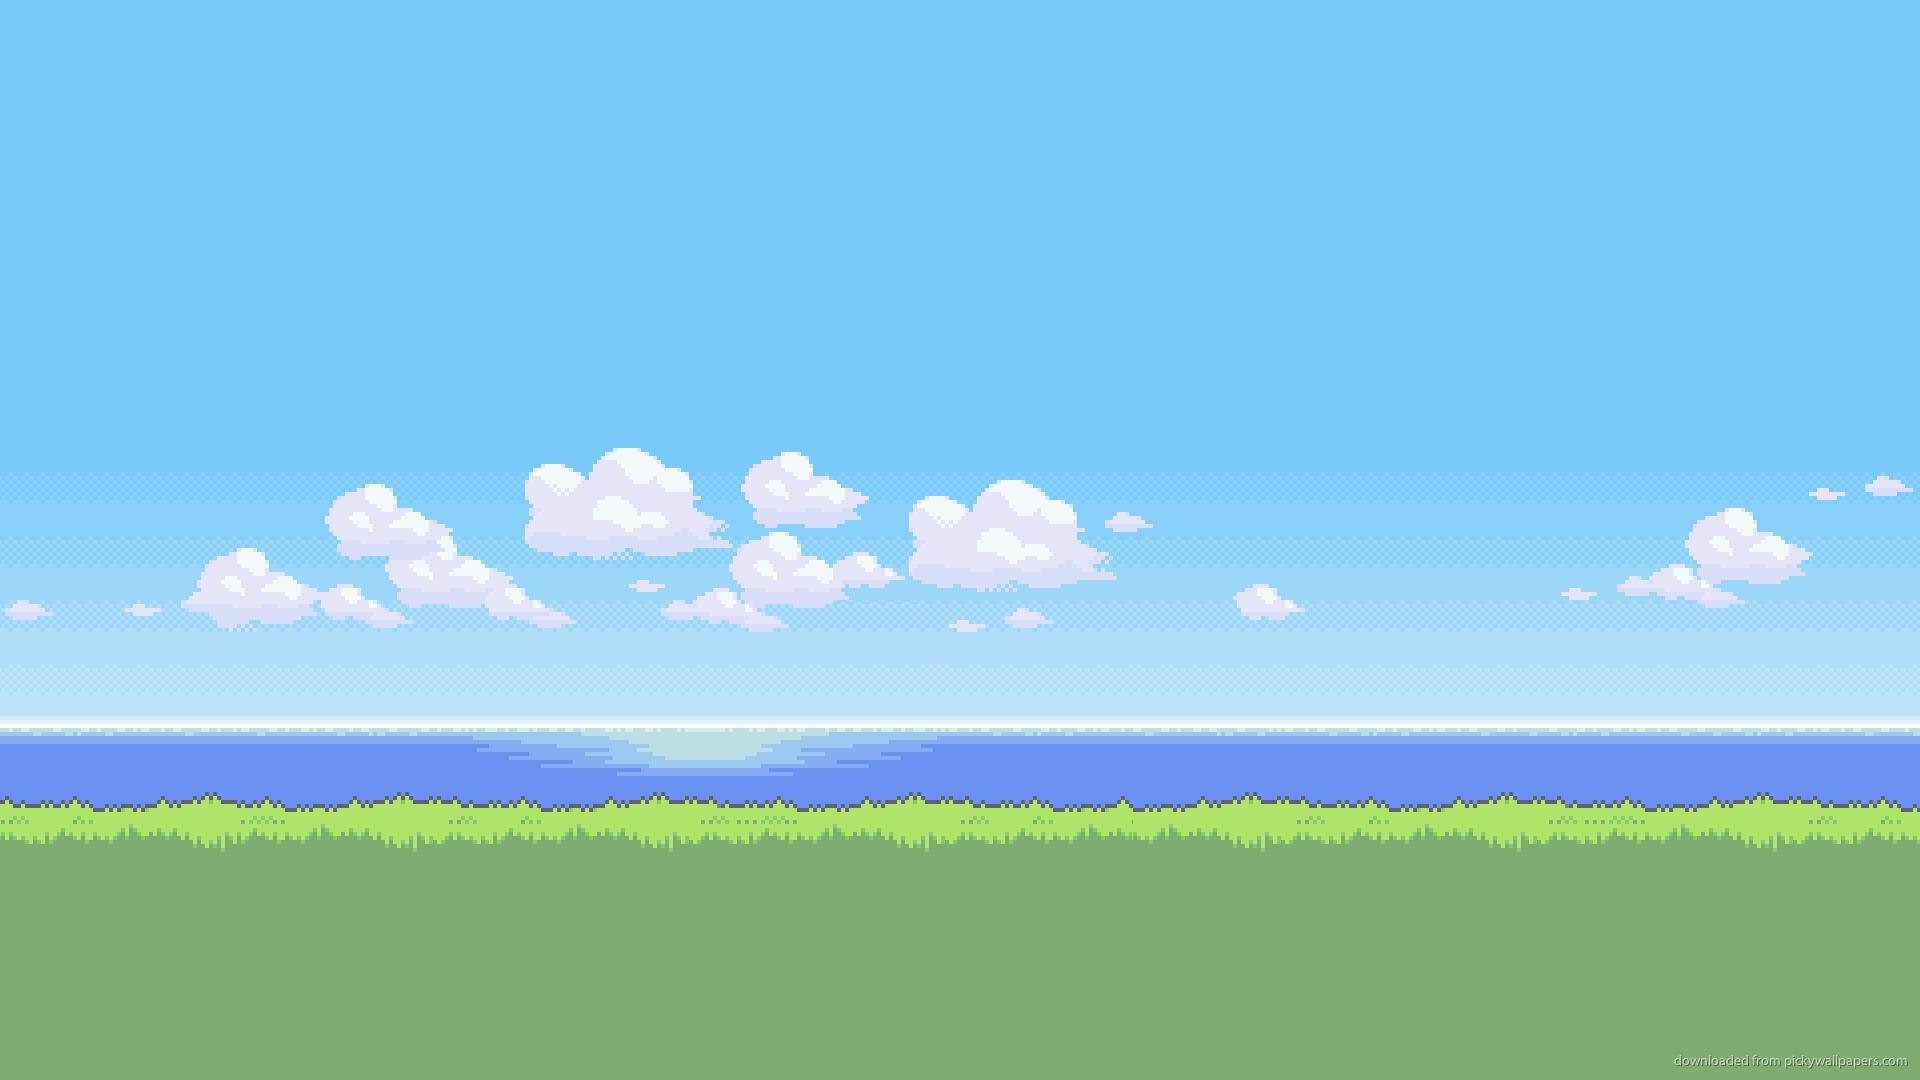 Download 1920x1080 Clean Pixel Landscape Wallpaper 1920x1080